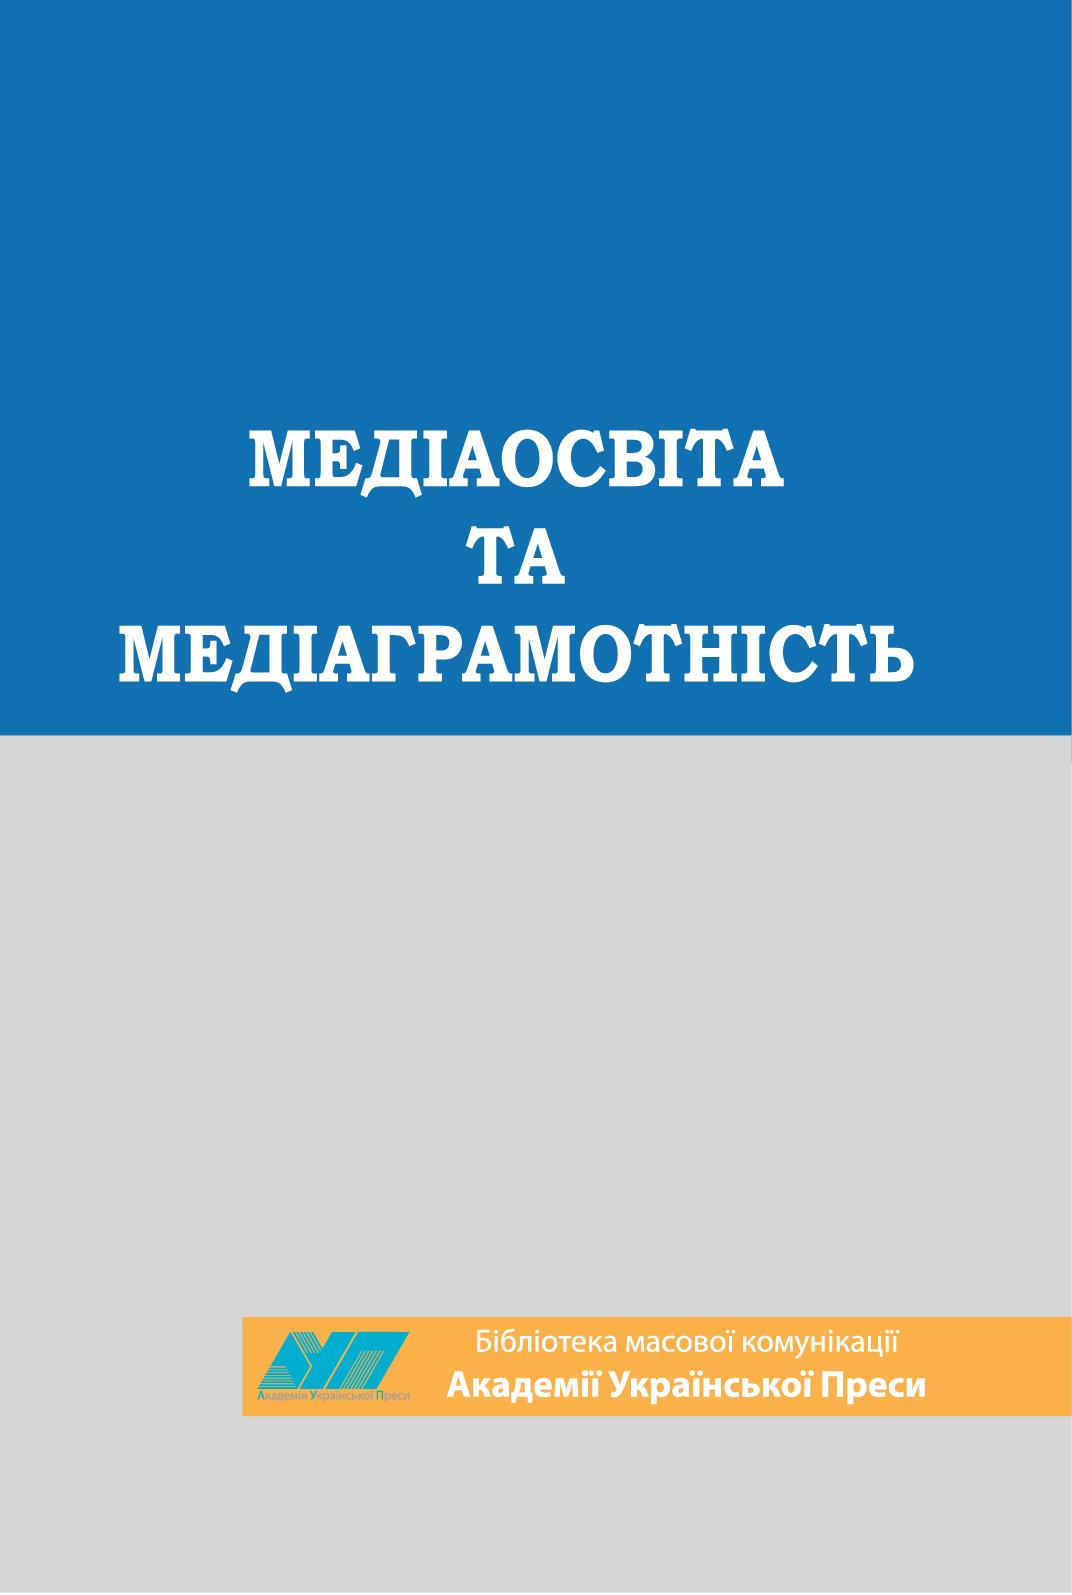 Calaméo - Mediapidruchnik 4ac70ccfd1767